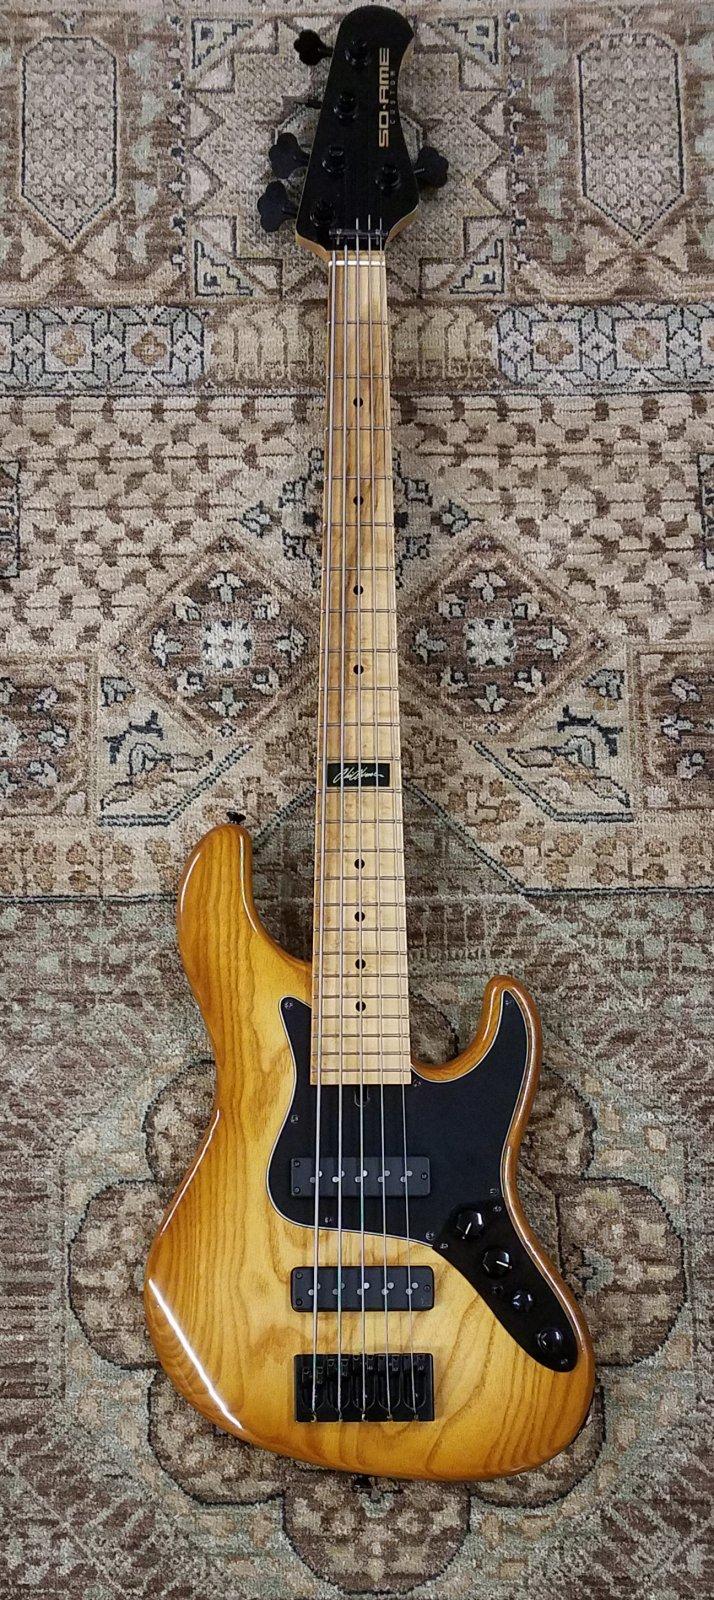 Used Soame JH524 Custom Abi Alvarez Bass in Honeyburst w/ Deluxe Gig Bag